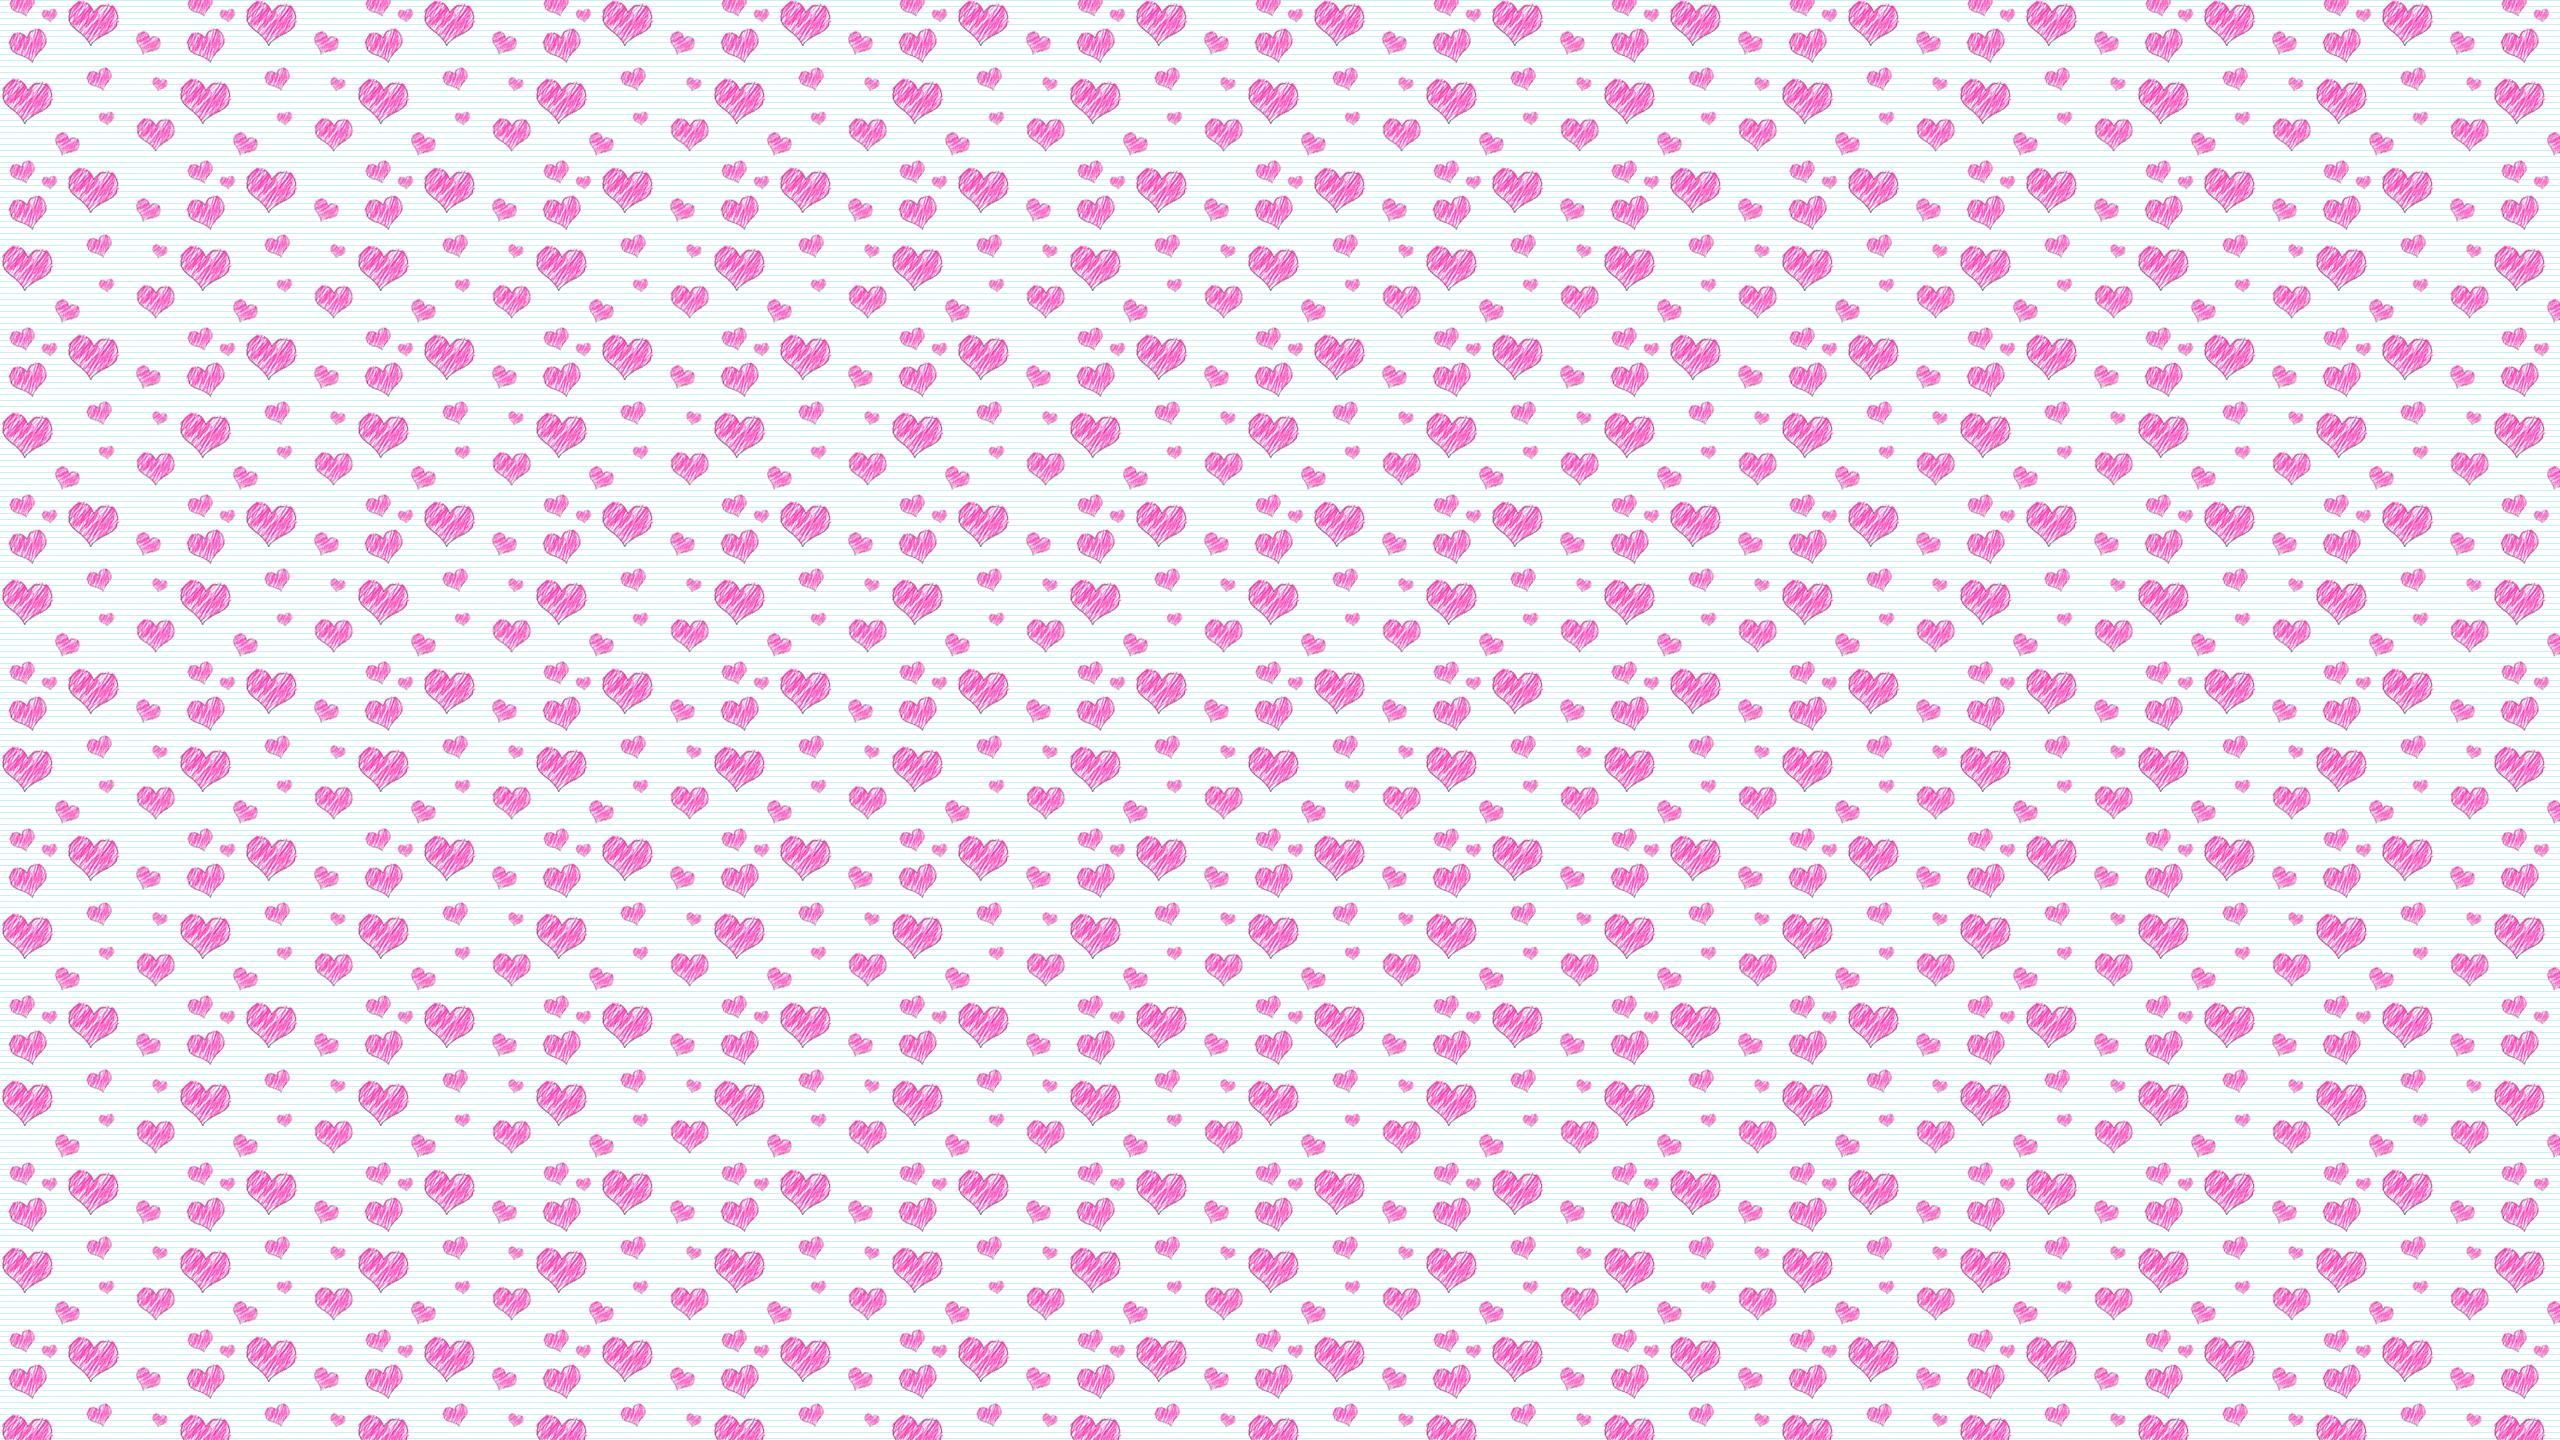 Heart Desktop Backgrounds Posted By Christopher Johnson